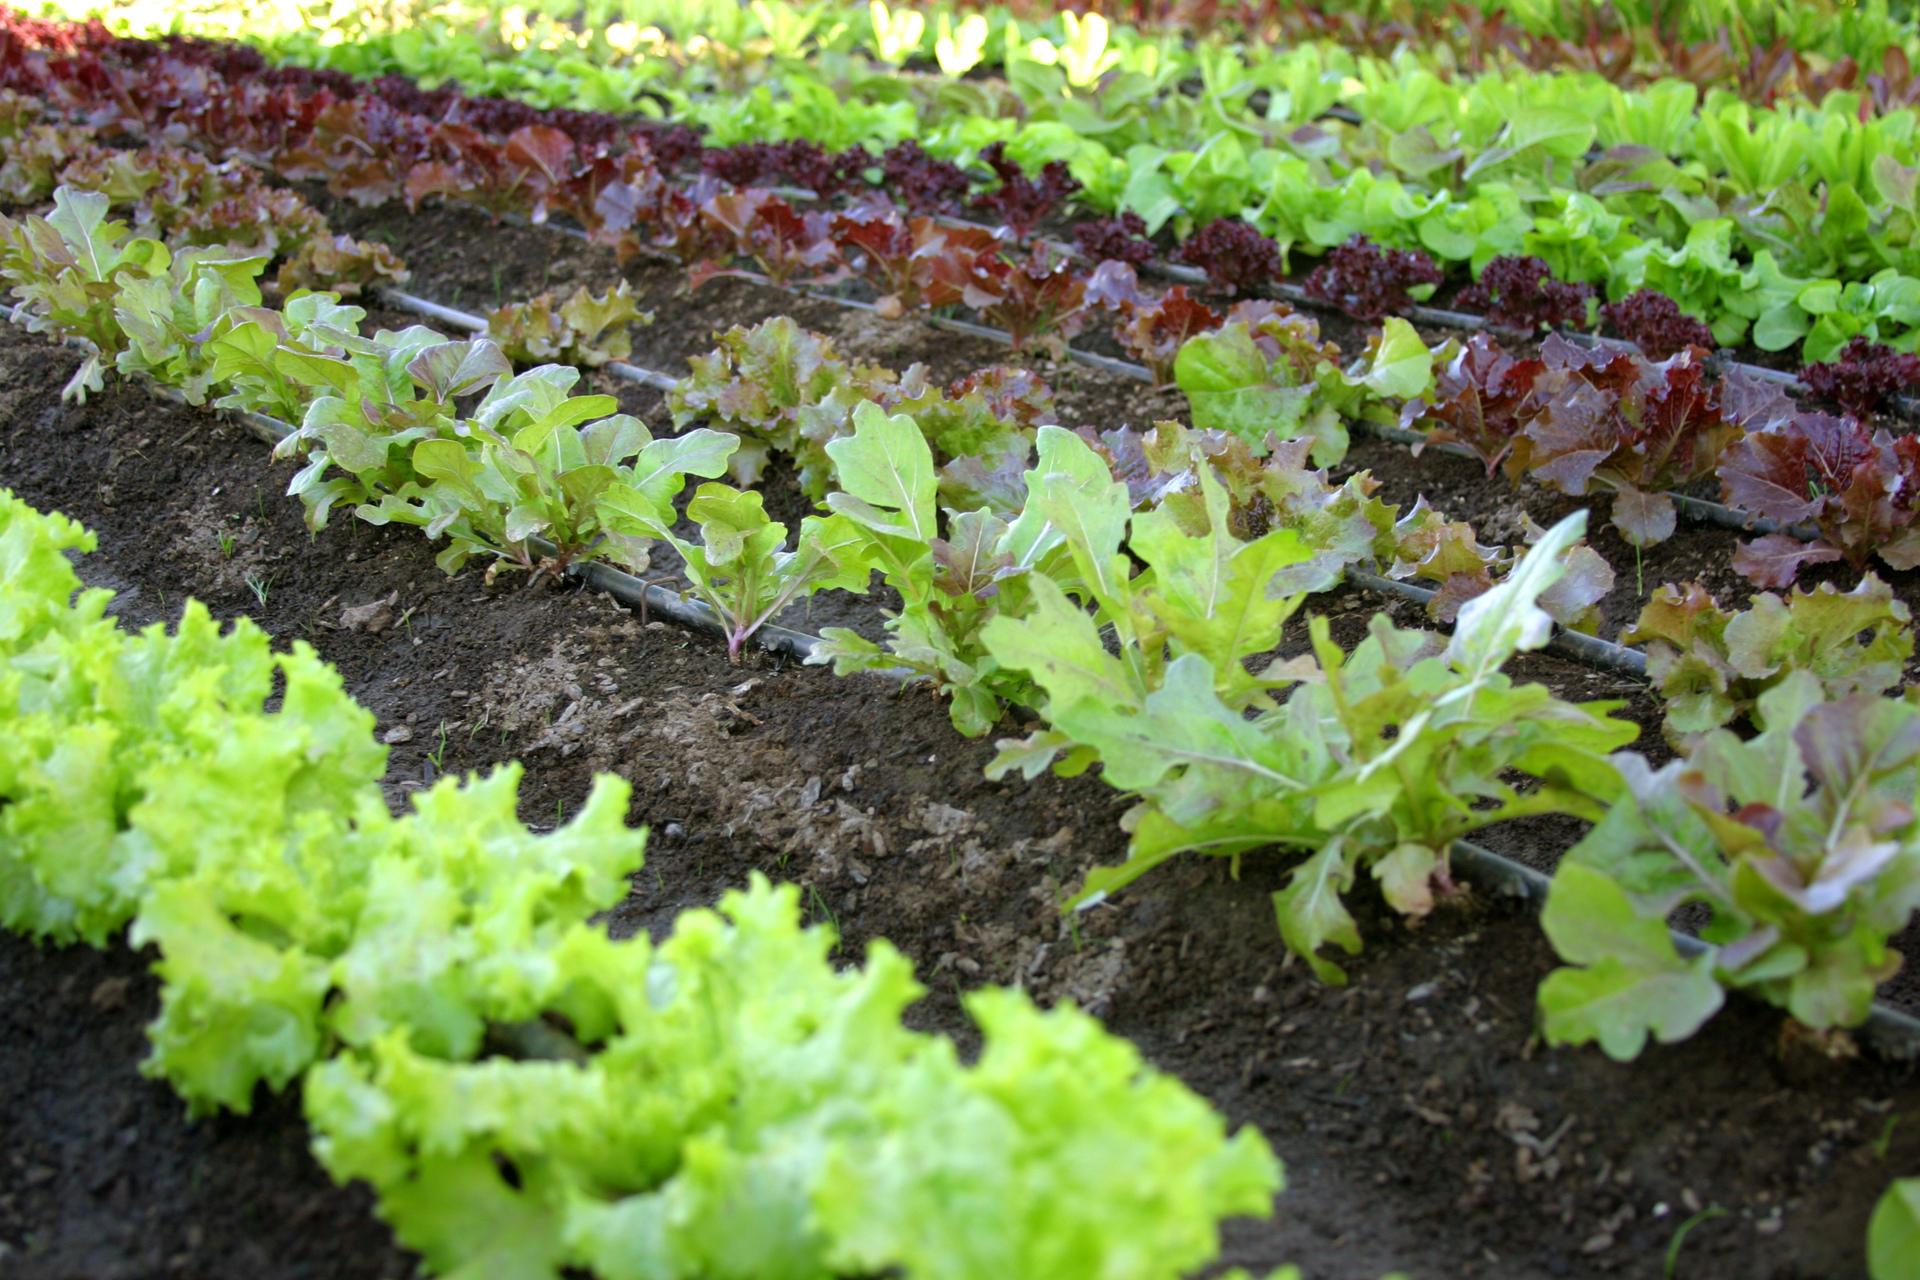 Superieur Organic Vegetable Garden U2013 Ku0026K Superblend Fertilizer For Organic Crops